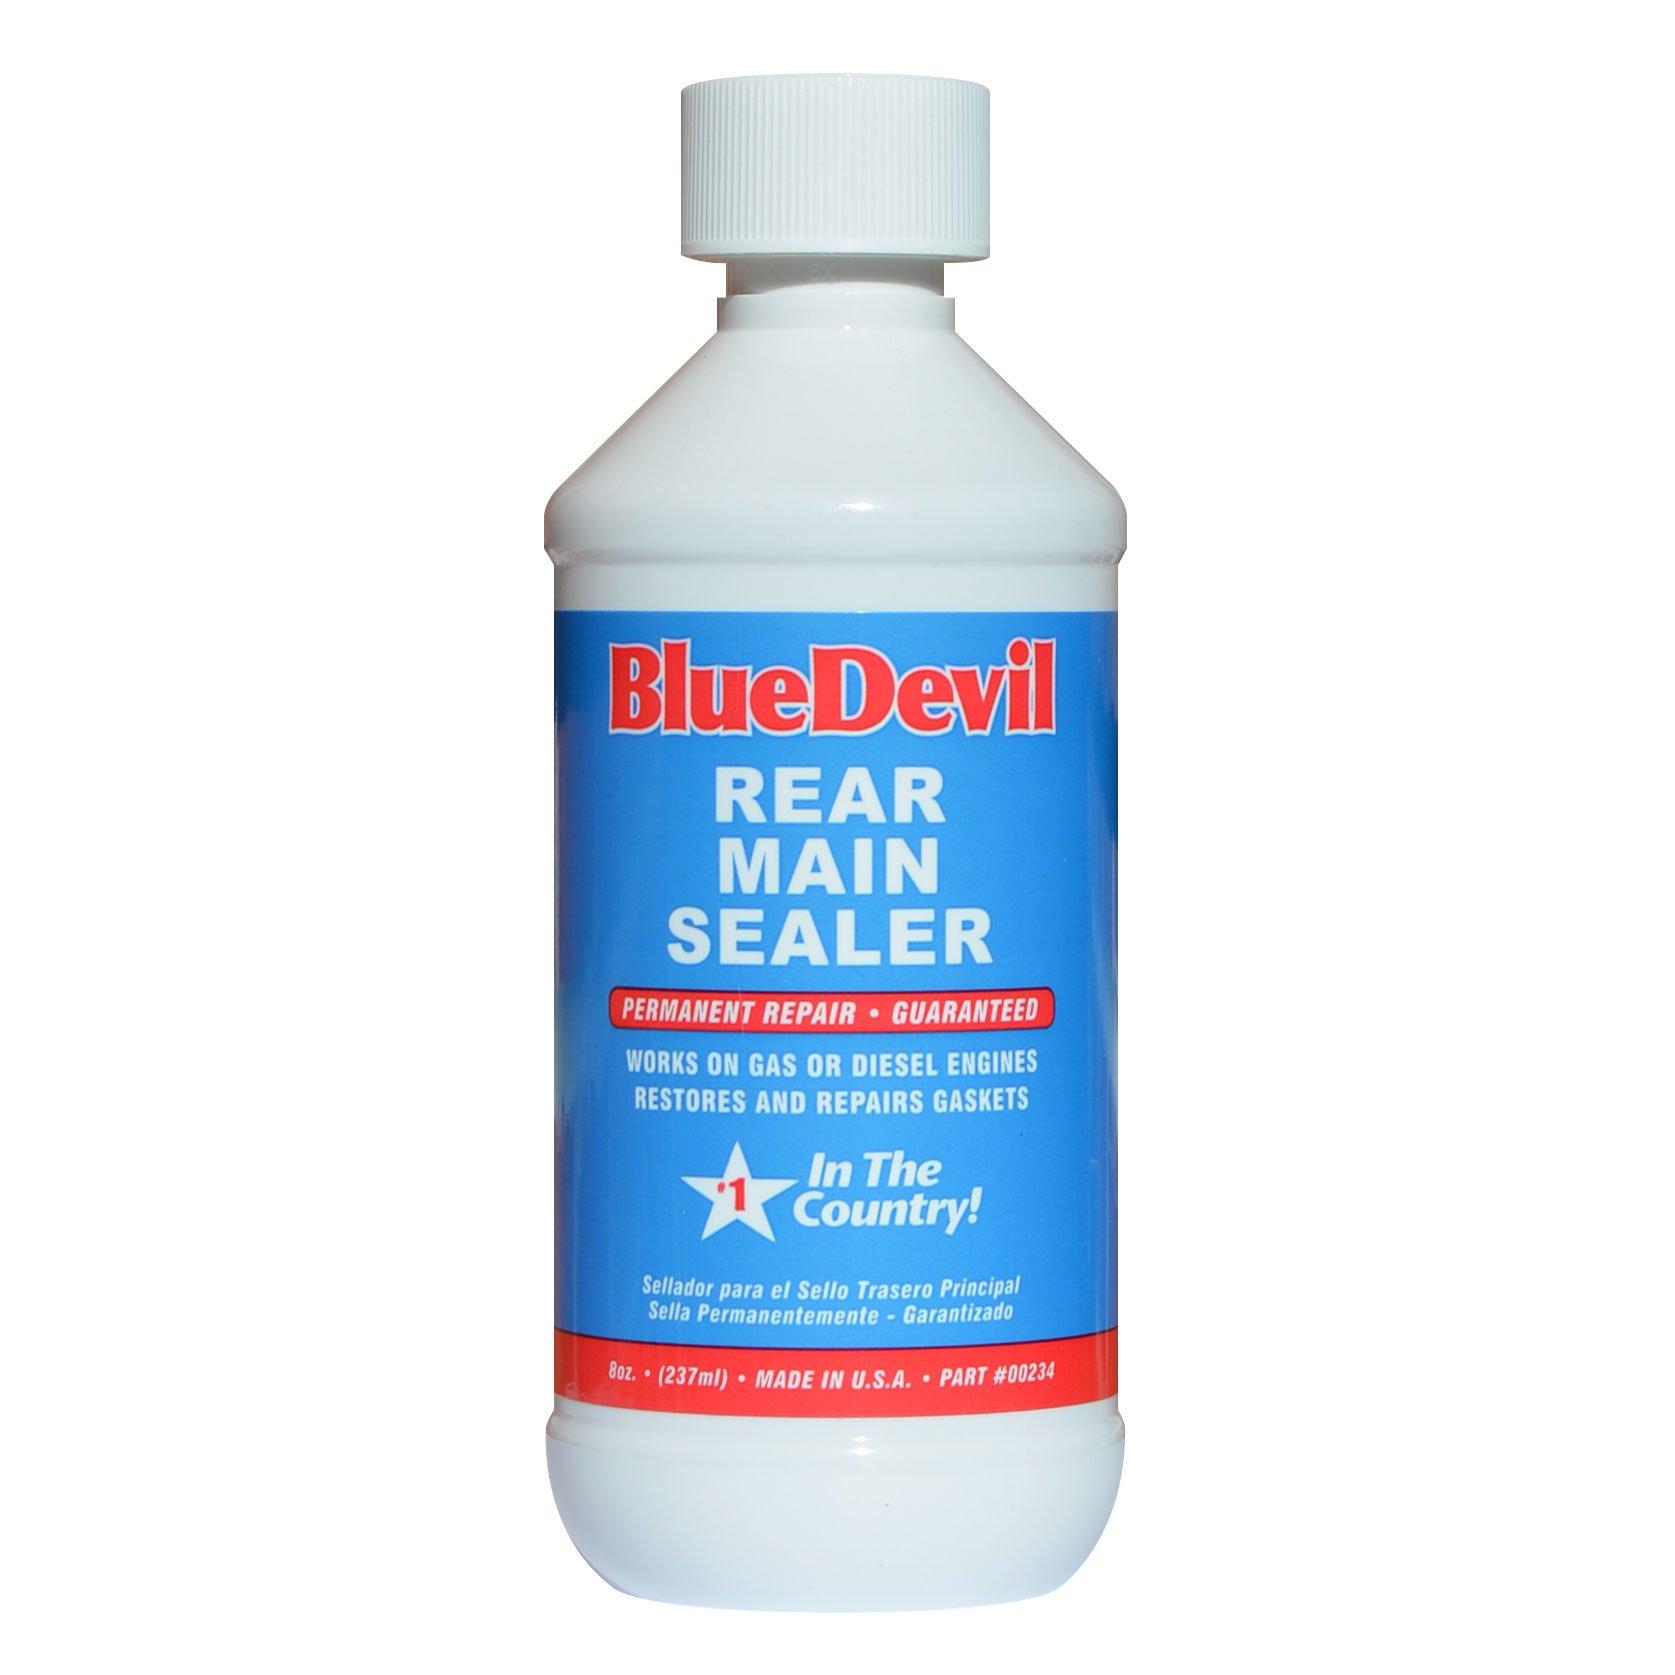 Blue Devil Rear Main Sealer - 8 Ounce (00234)